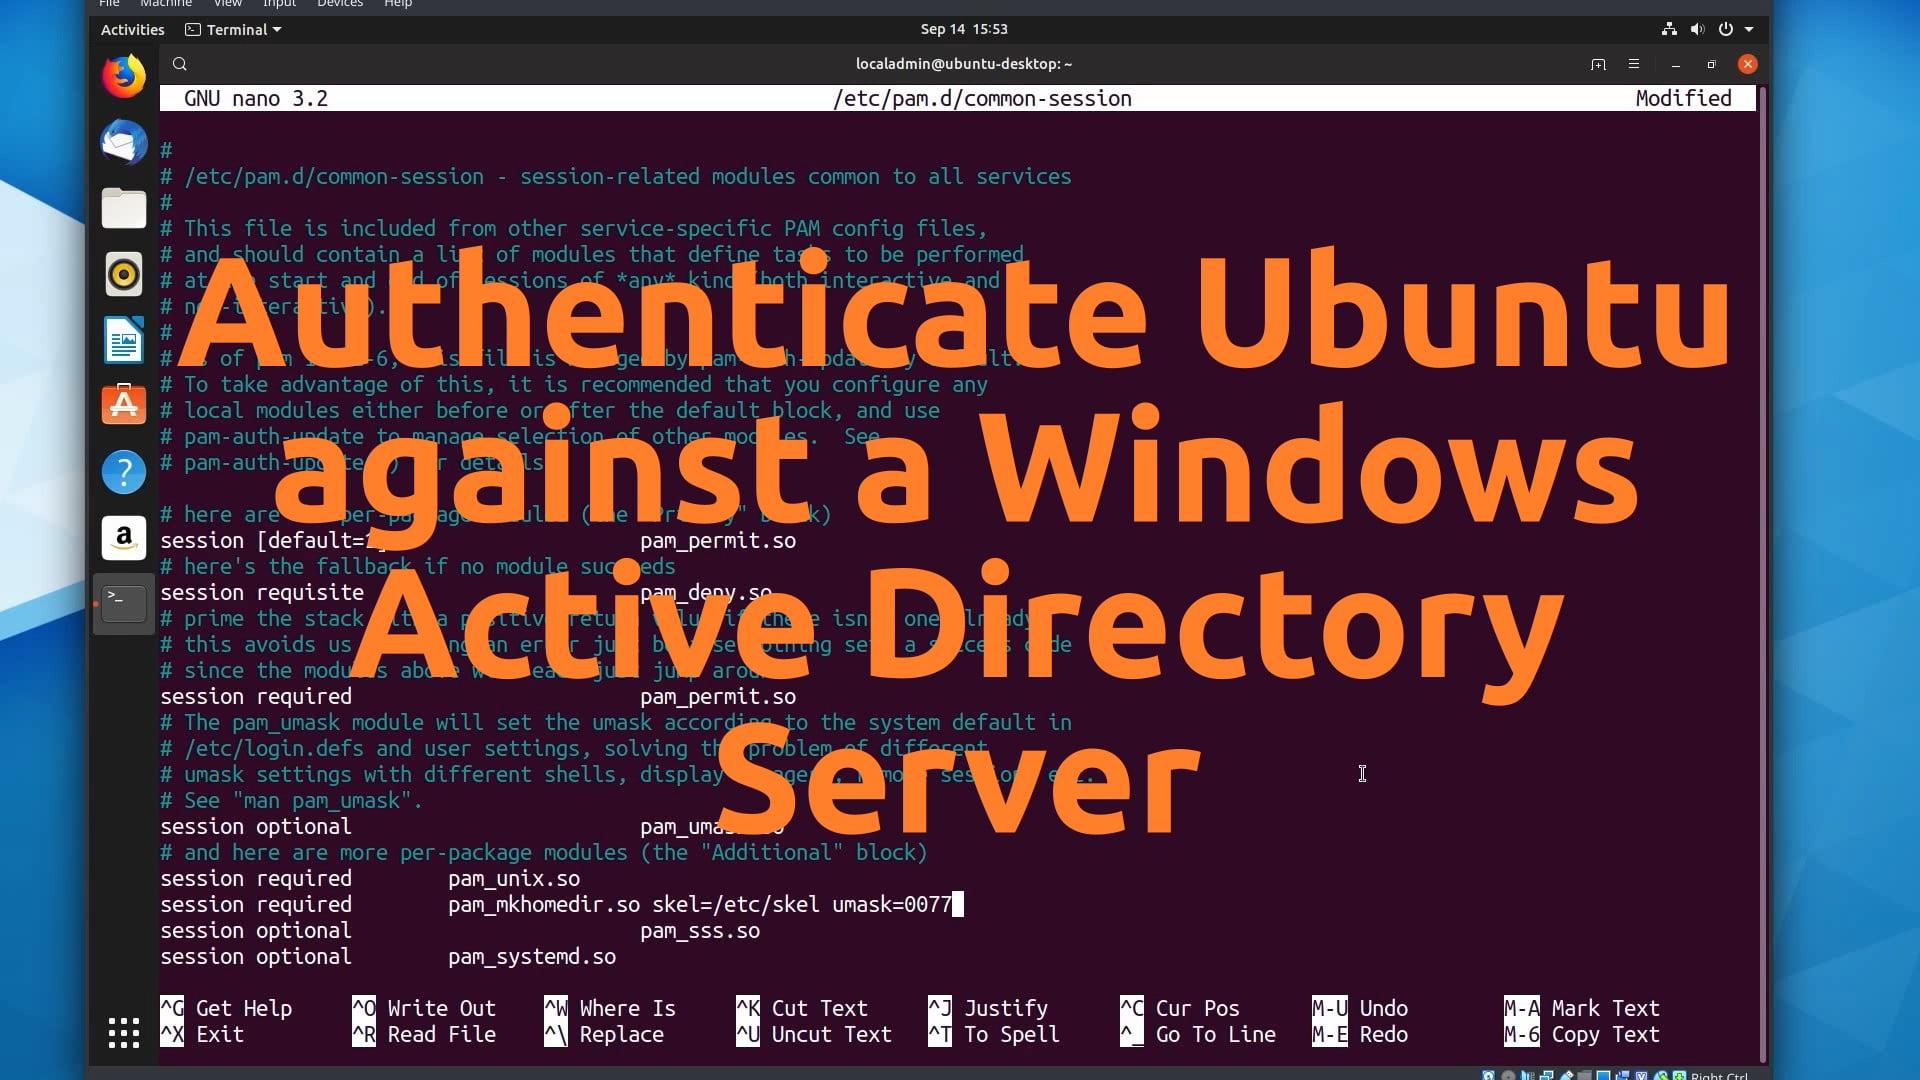 Authenticate Ubuntu against Active Directory